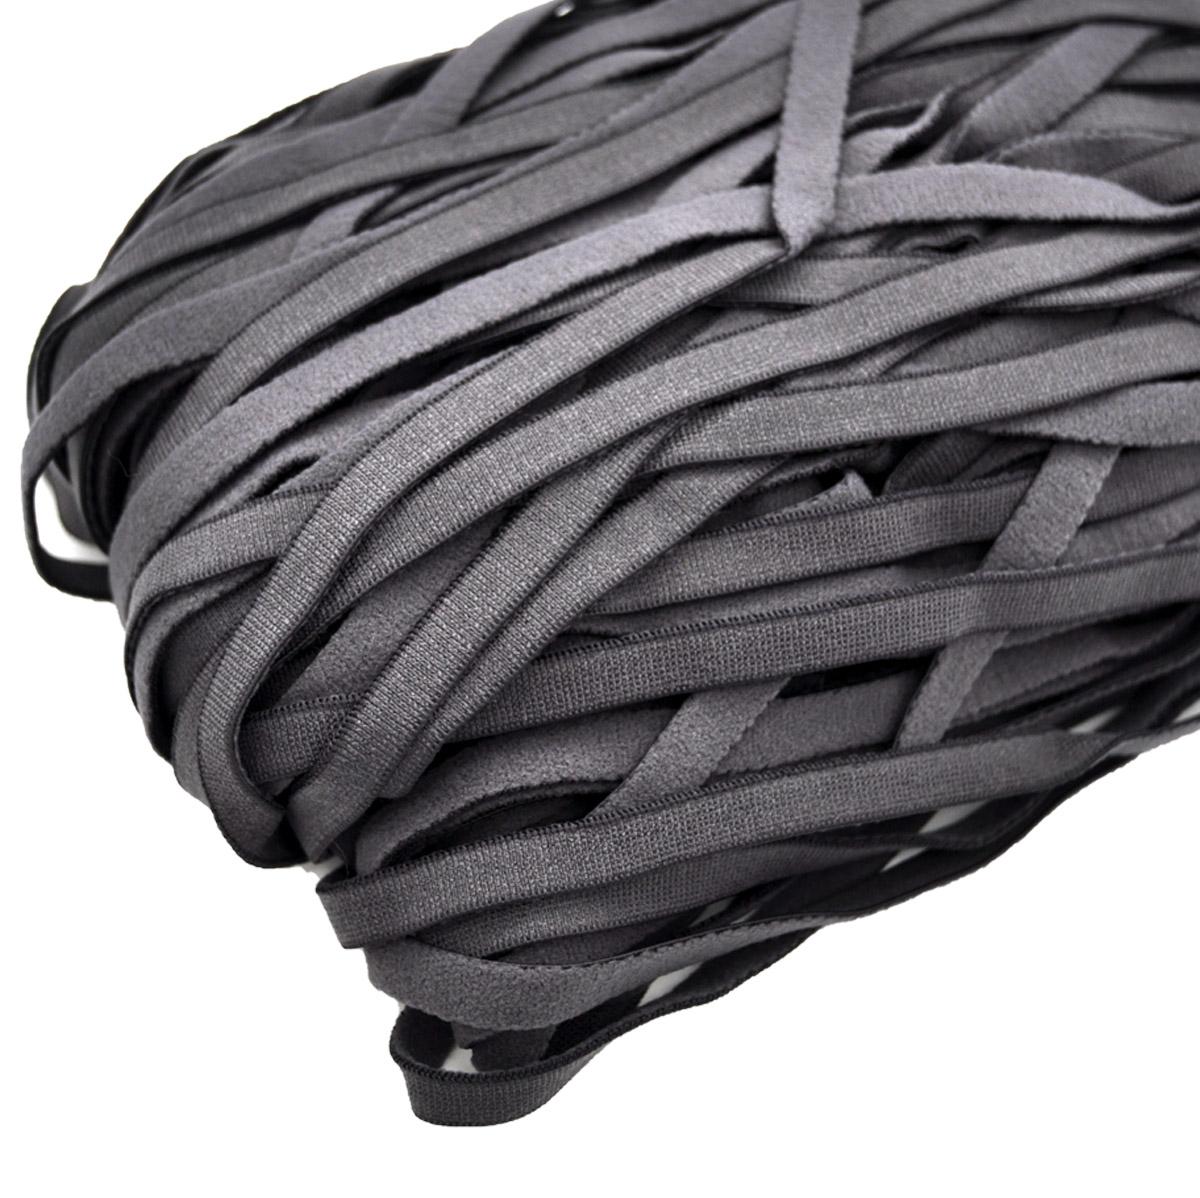 STD/34 эластичная отделочная лента 8мм*50м, графит